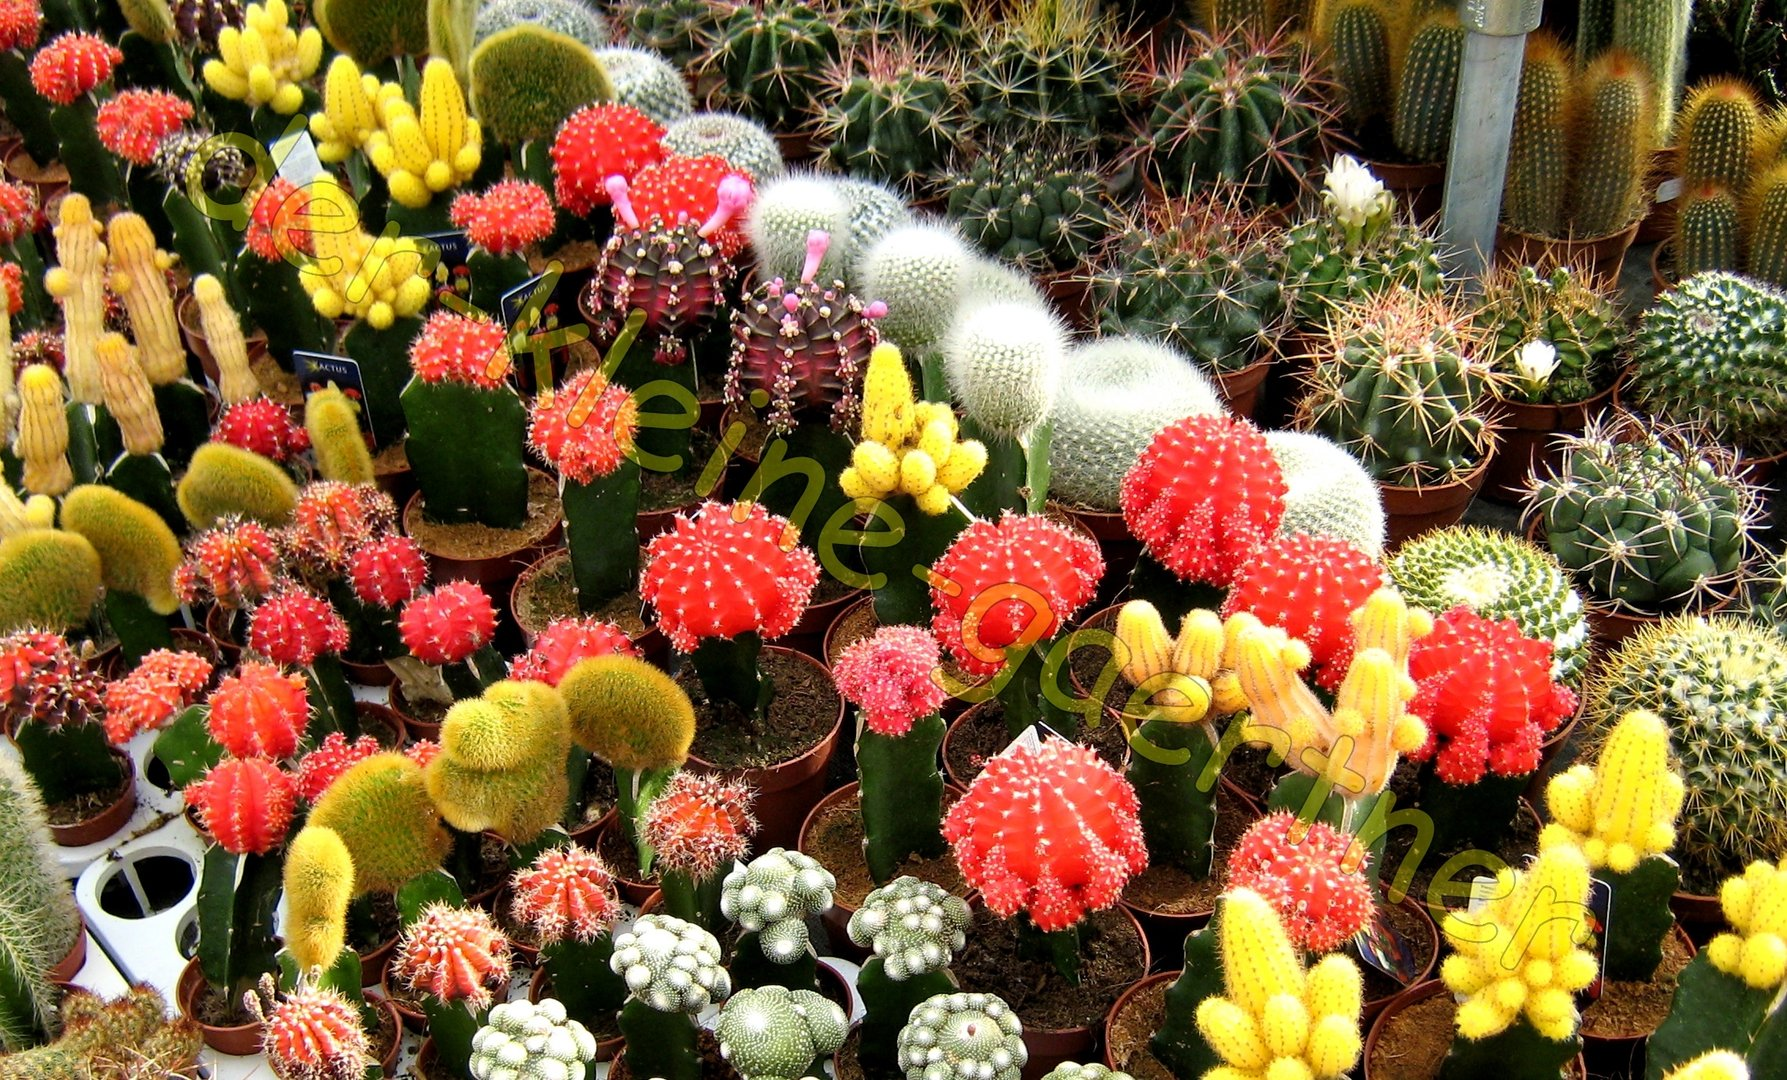 kakteen mix mit bunten bl ten kaktus 40 samen online kaufen. Black Bedroom Furniture Sets. Home Design Ideas